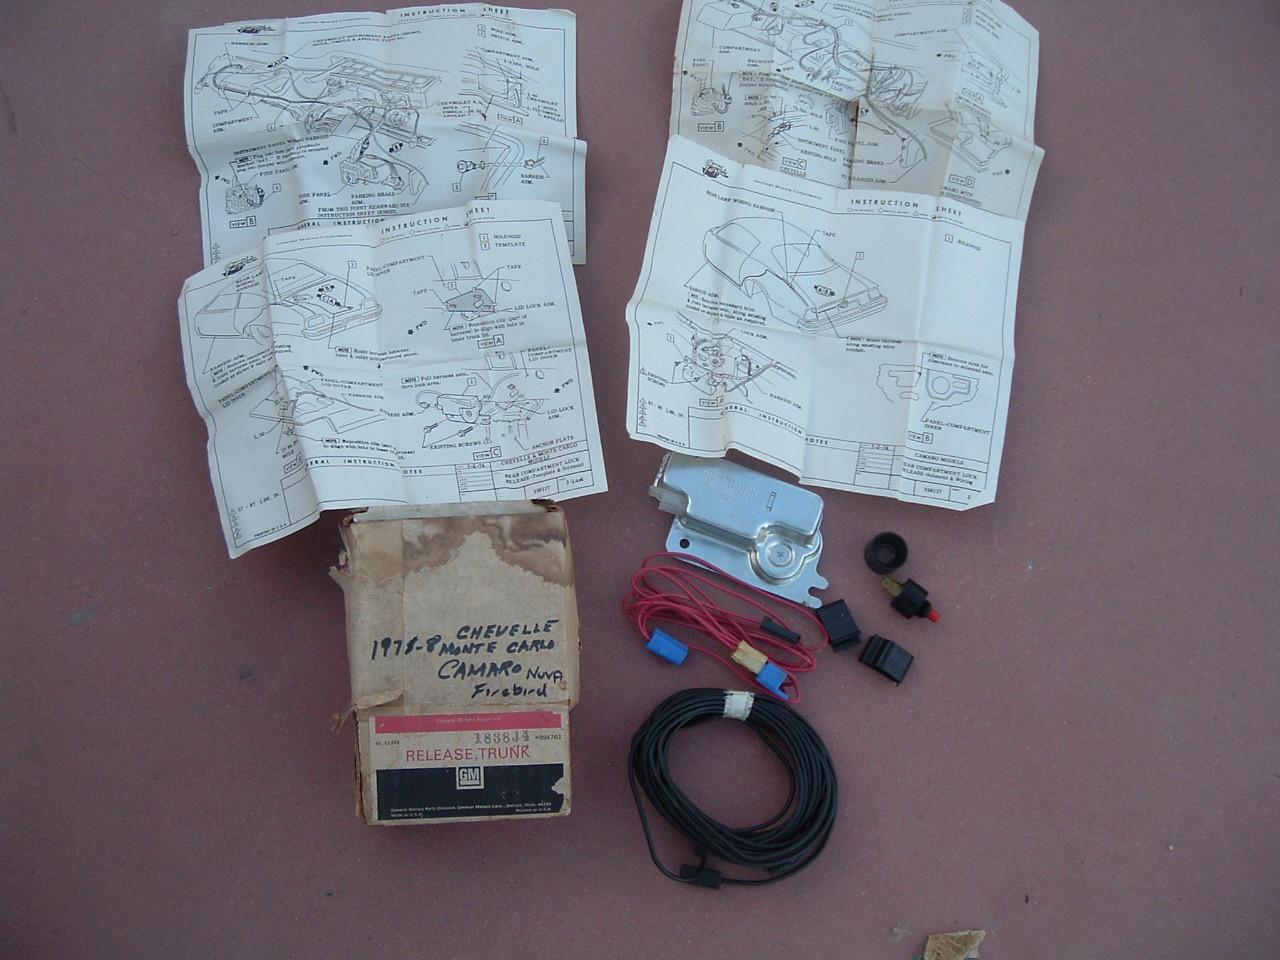 1976 77 78 camaro monte carlo trunk opener accessory kit NOS gm # 994763 (z 9954763)